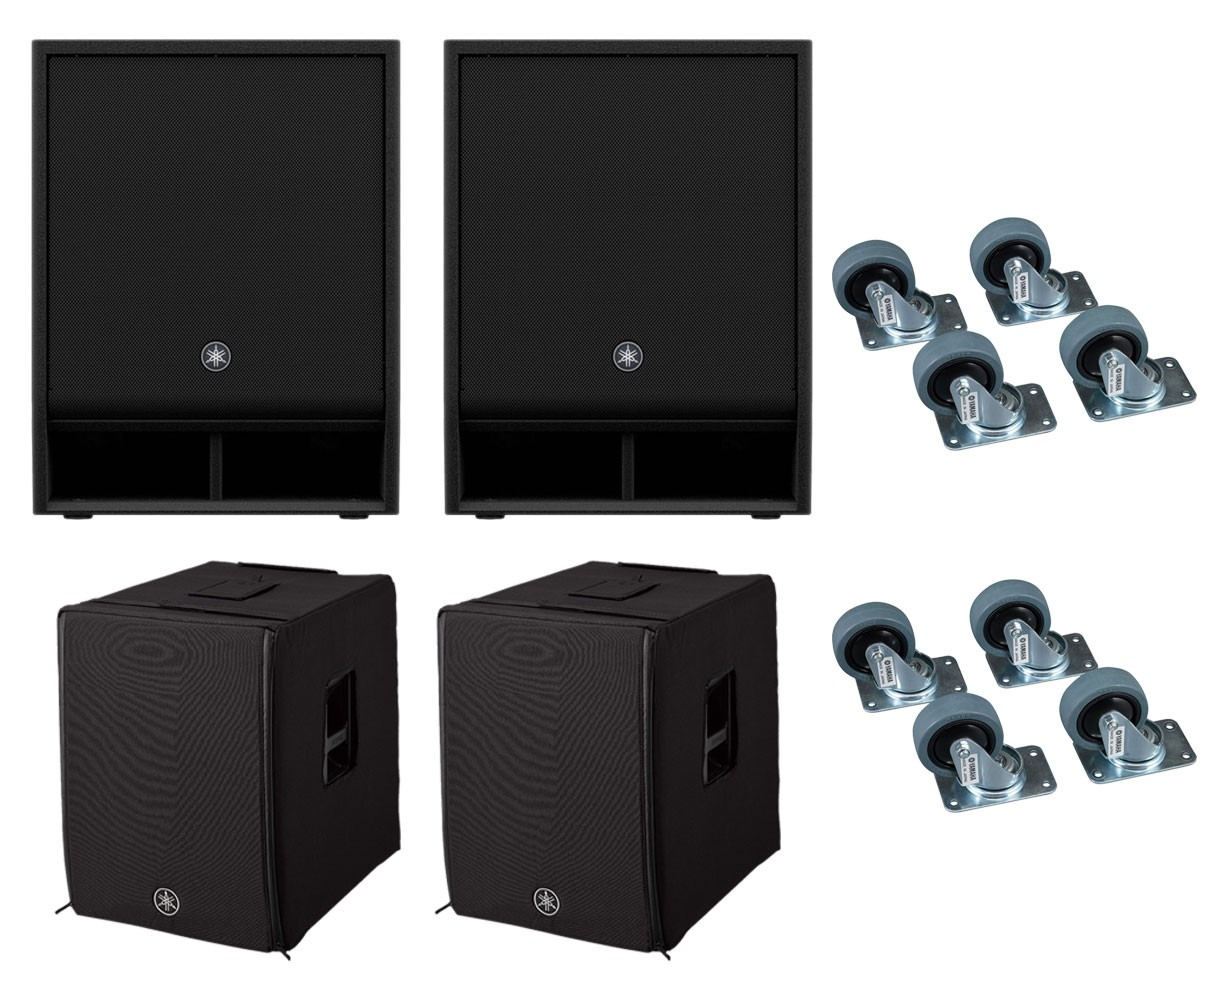 2x Yamaha DXS15XLF + Covers + Caster Kits